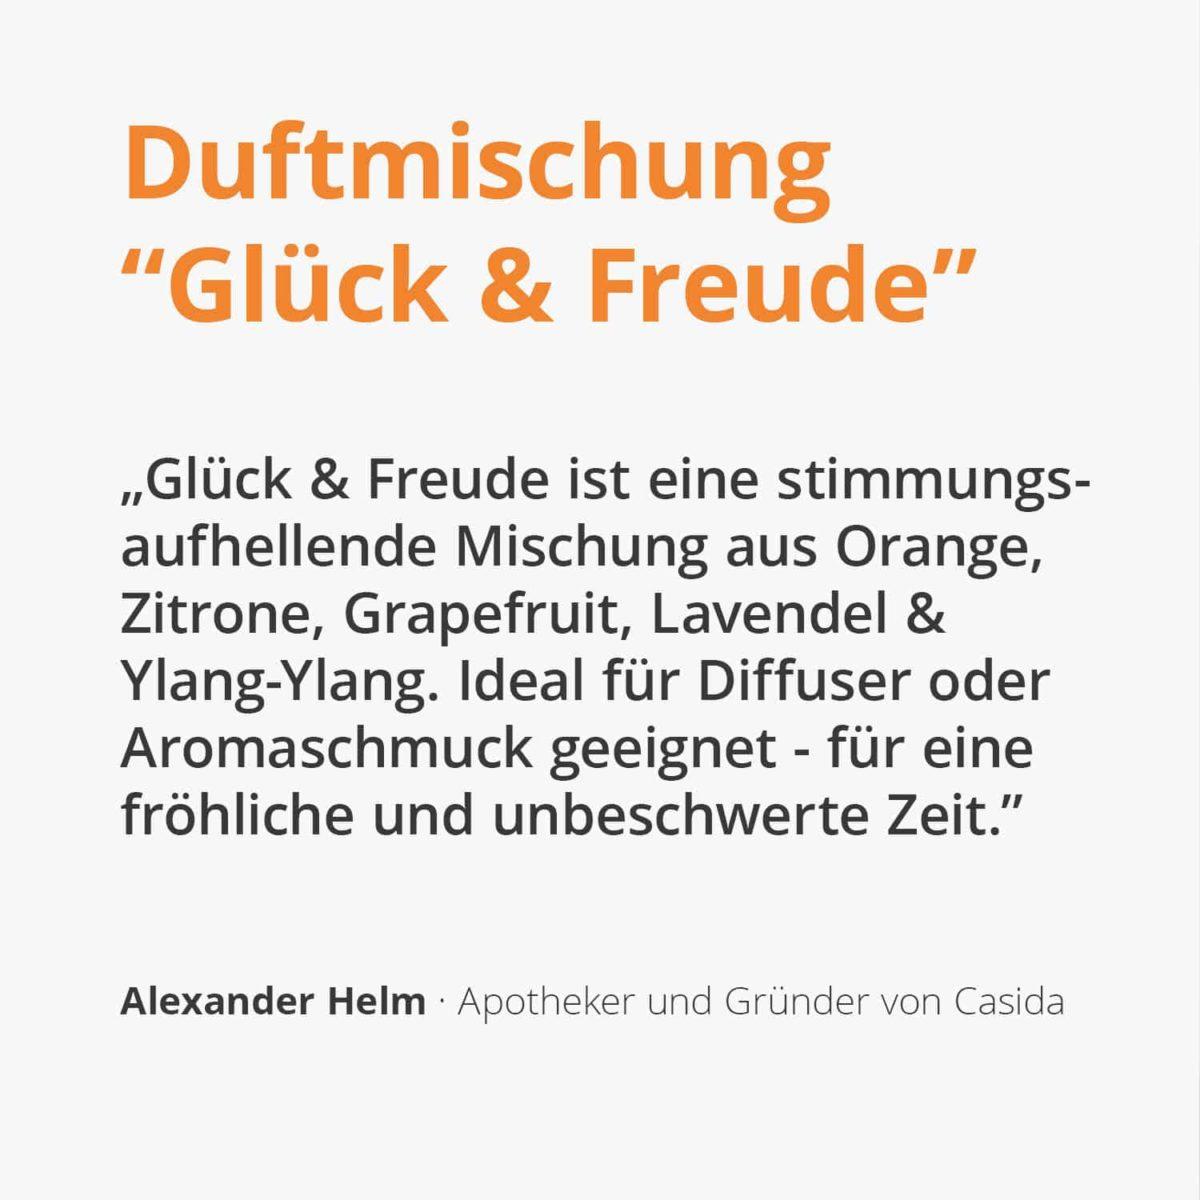 Casida Delightment Aroma-Blend Glück & Freude - 5 ml 17377217 PZN Apotheke aufheiternd gute laune Aromatherapie Aromapflege Aromaschmuck Diffuser2